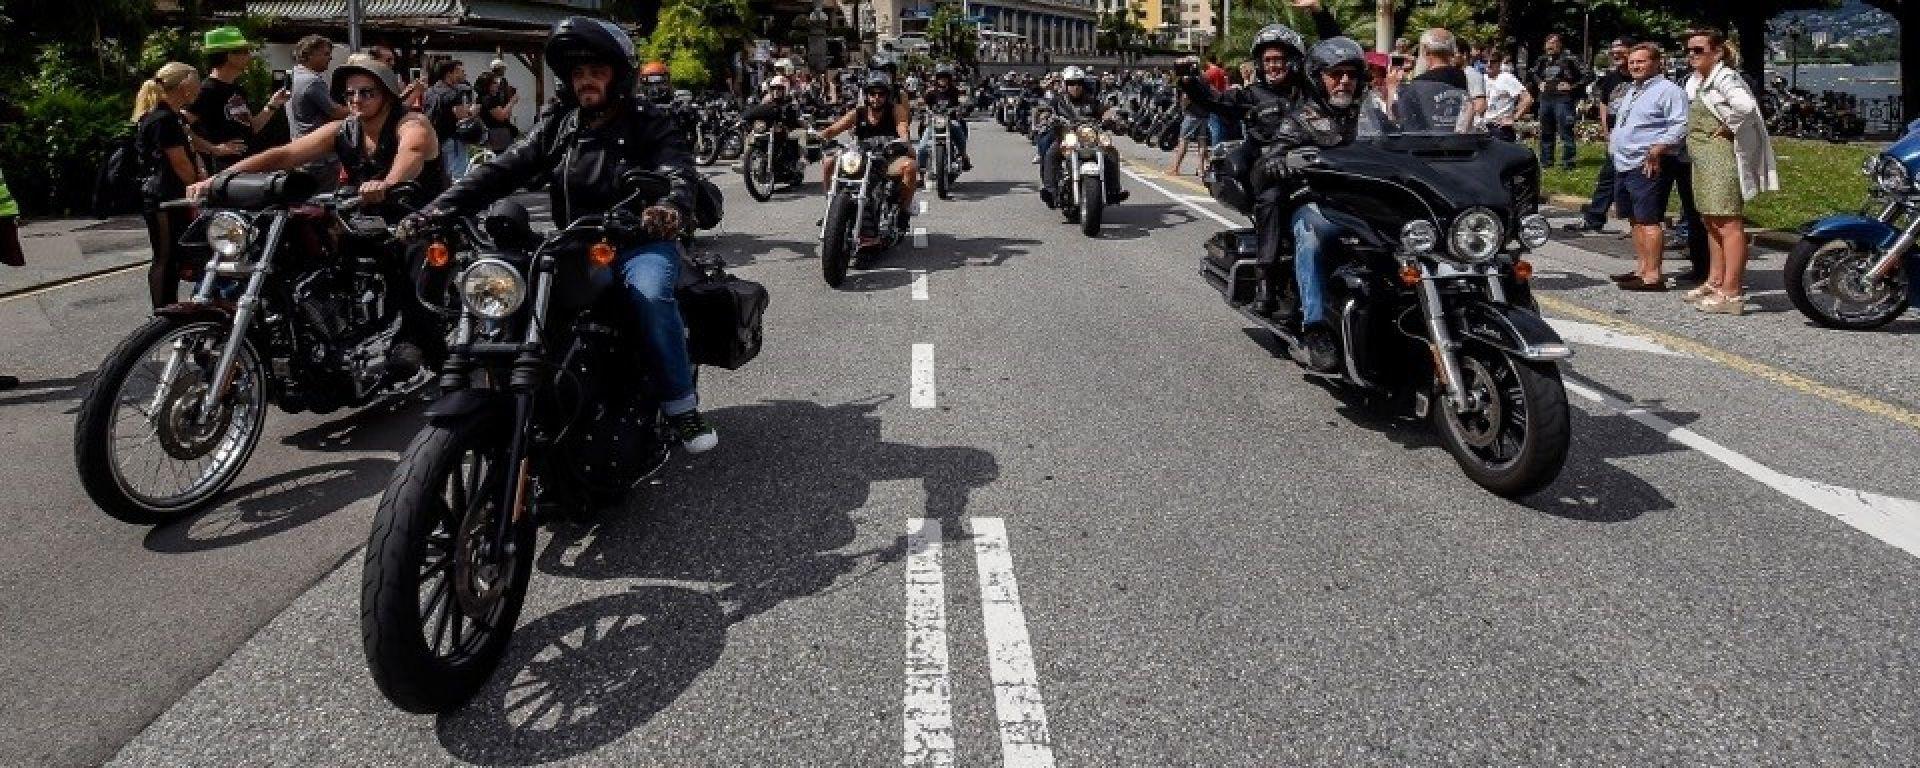 Swiss Harley Days